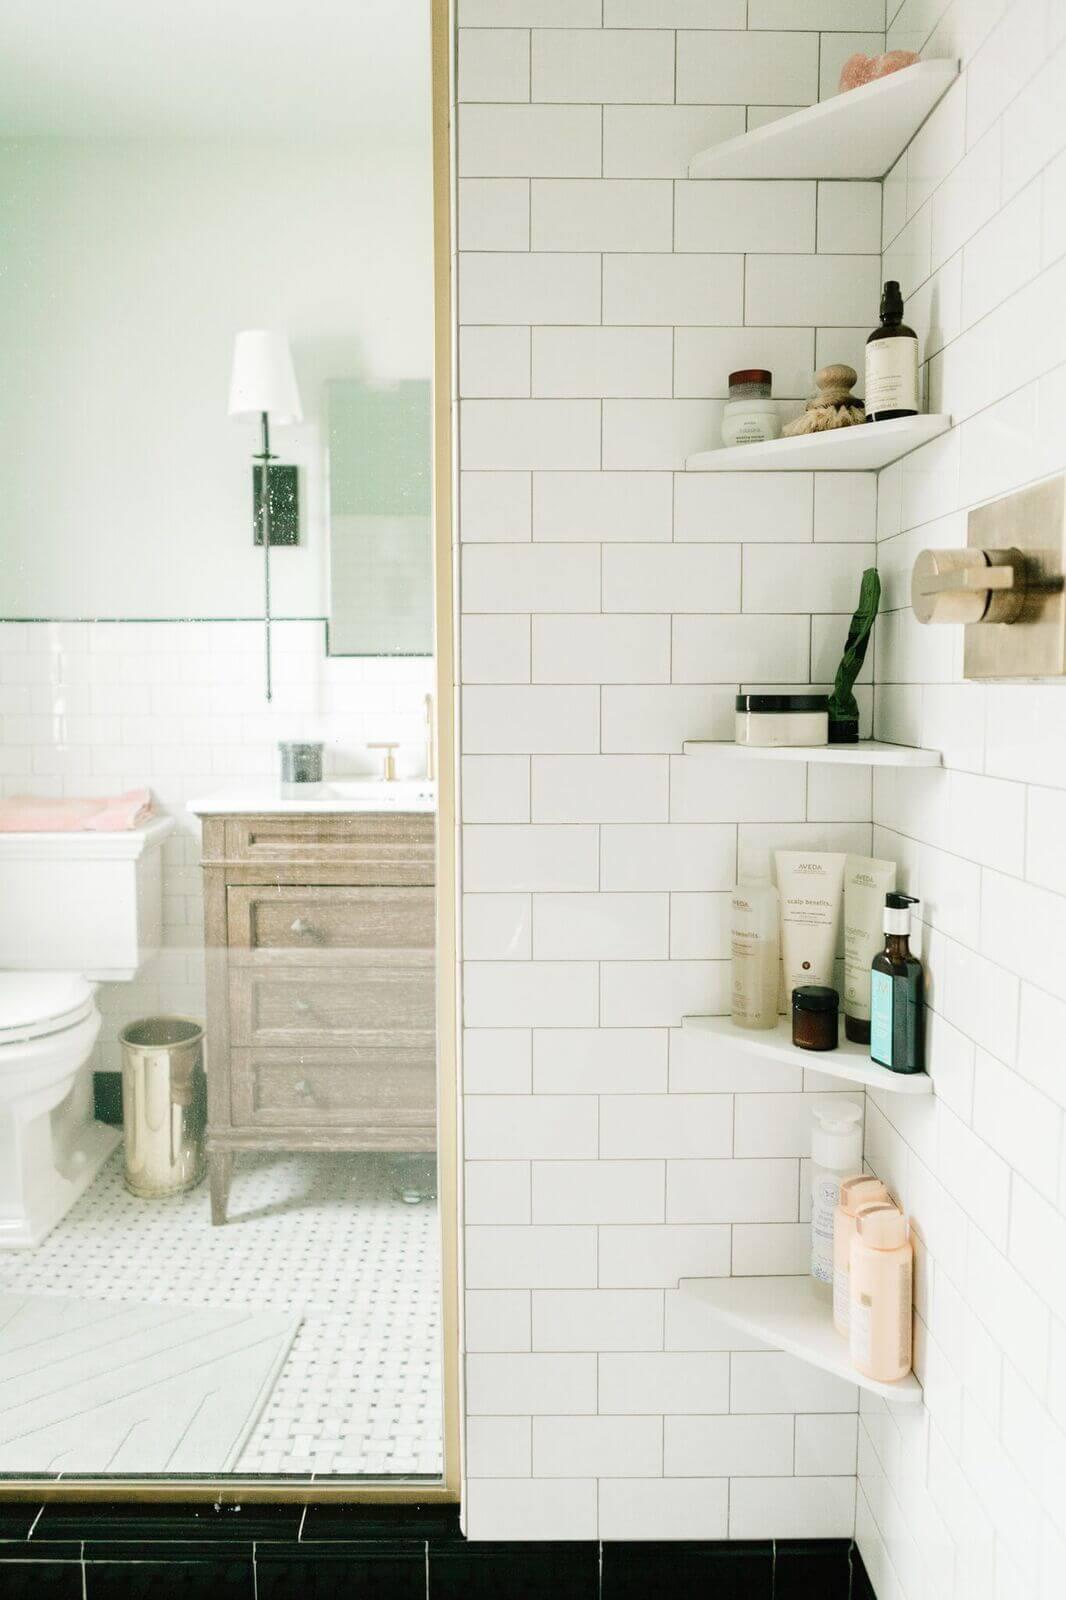 26 Best Shower Storage Ideas to Improve your Bathroom in 2020